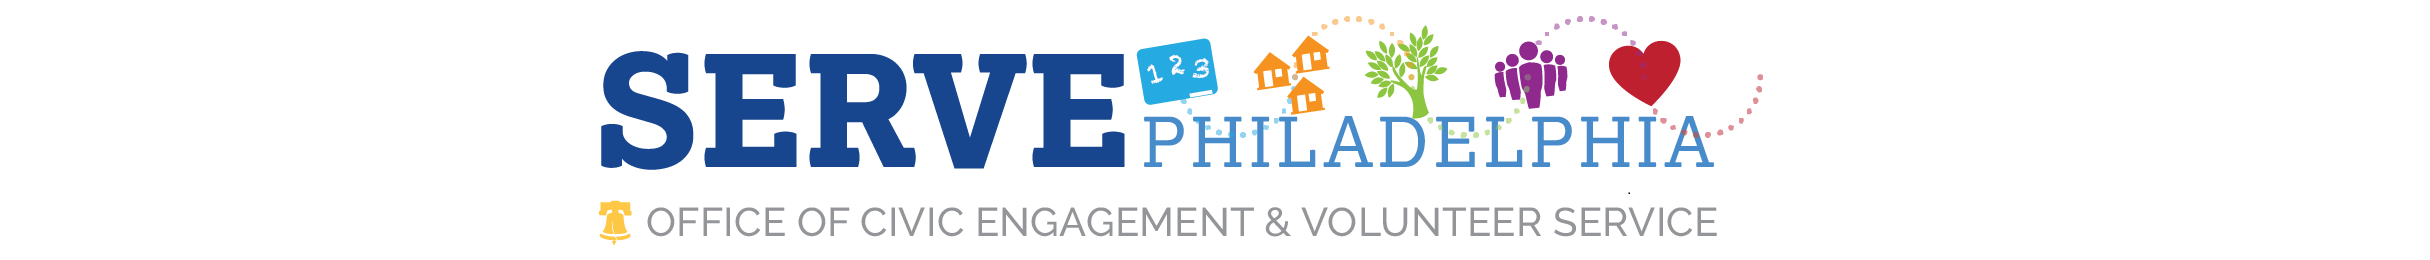 Serve Philadelphia